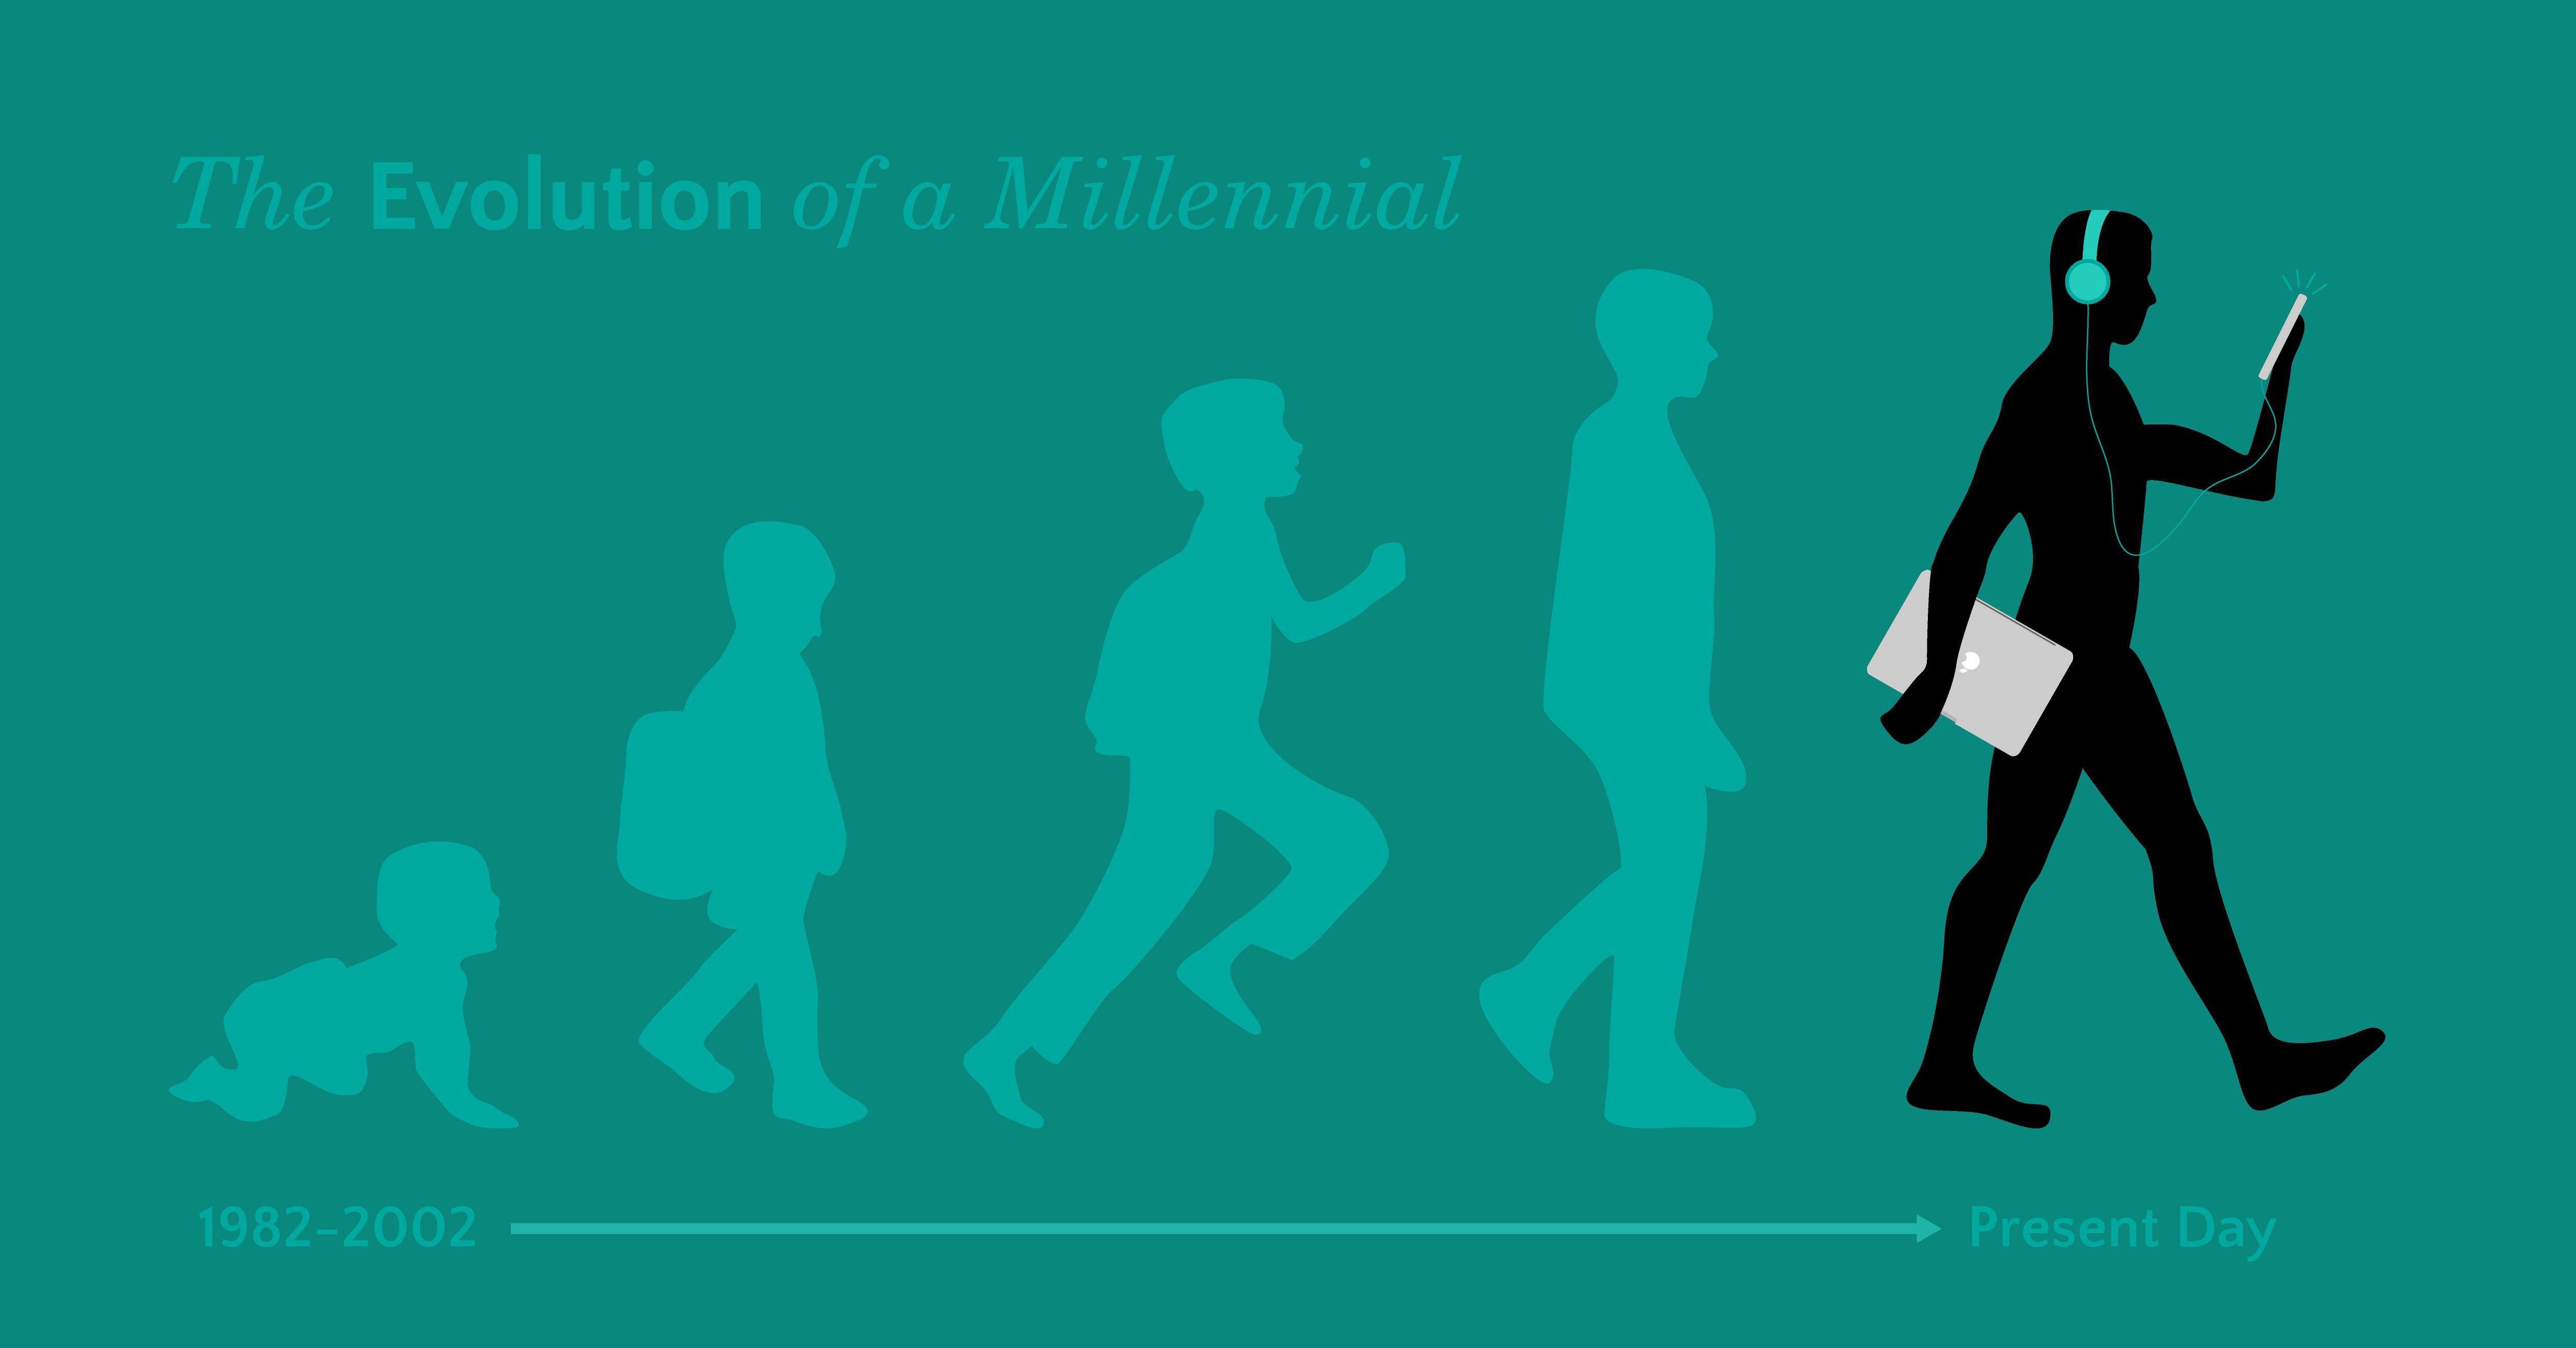 Blog_Millennials_Hero_Image-03-03-03.png